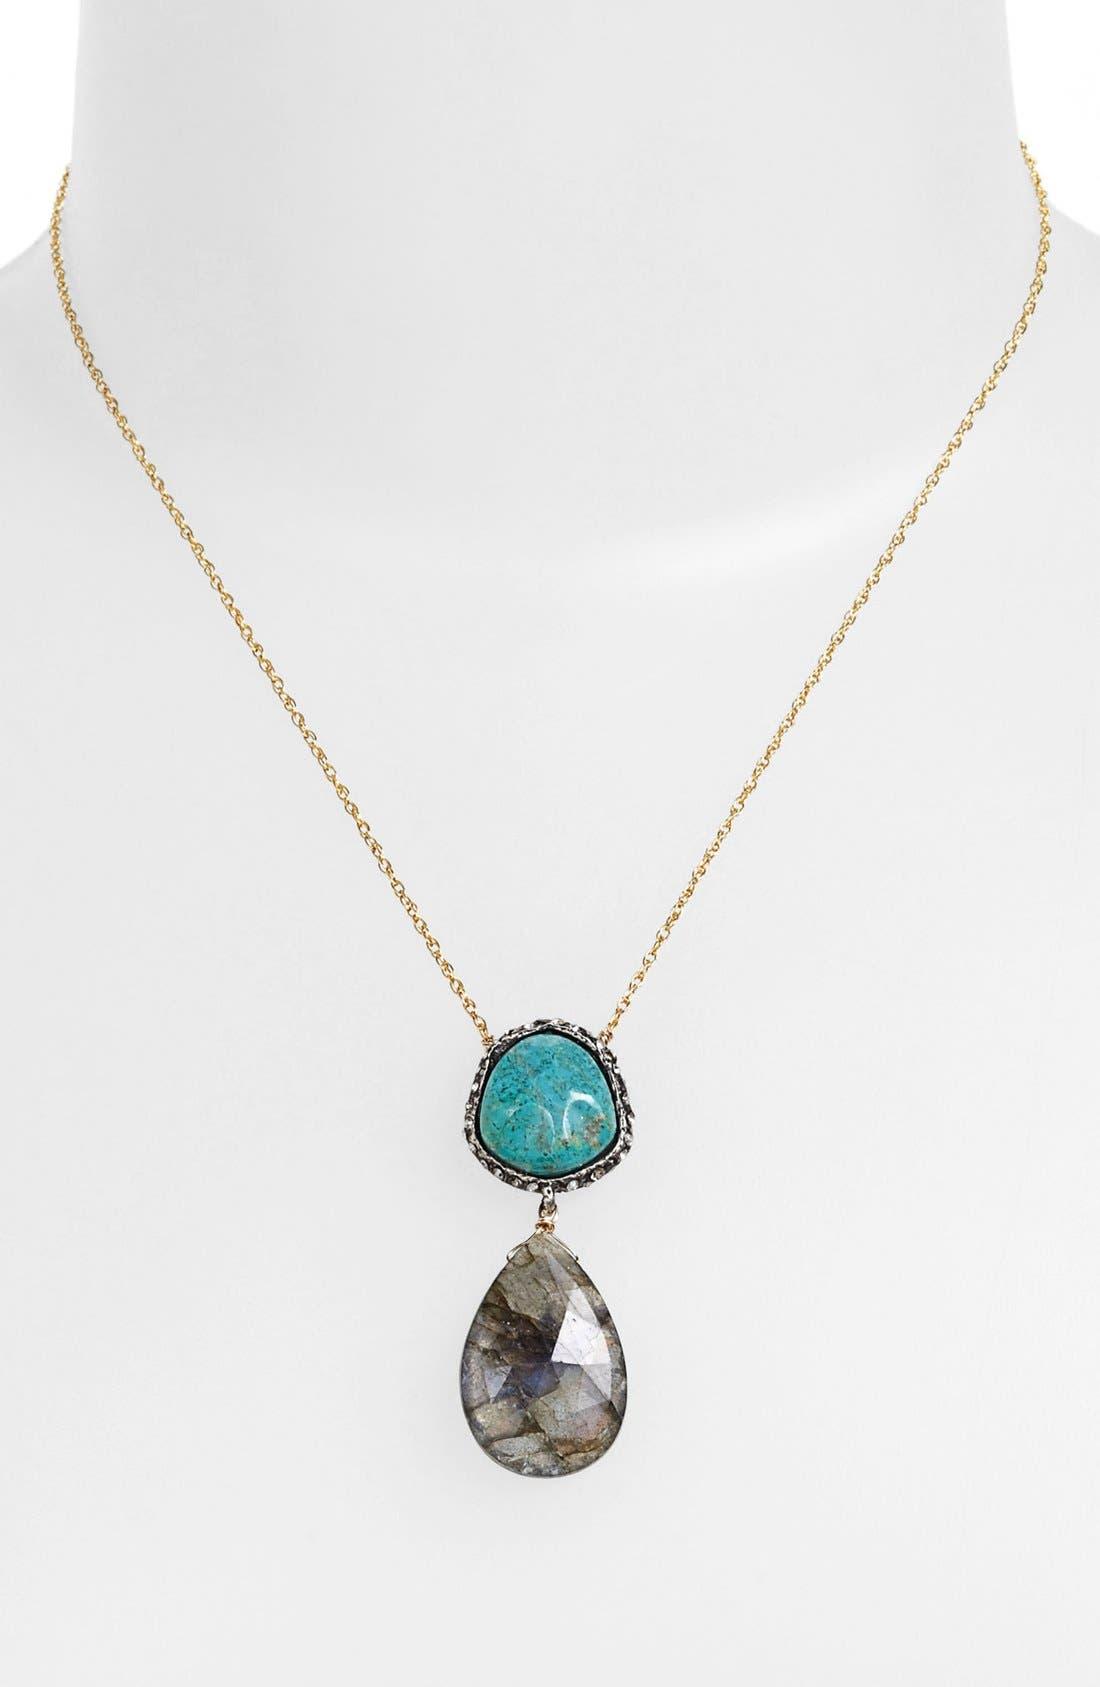 Main Image - Alexis Bittar 'Elements - Cordova' Pendant Necklace